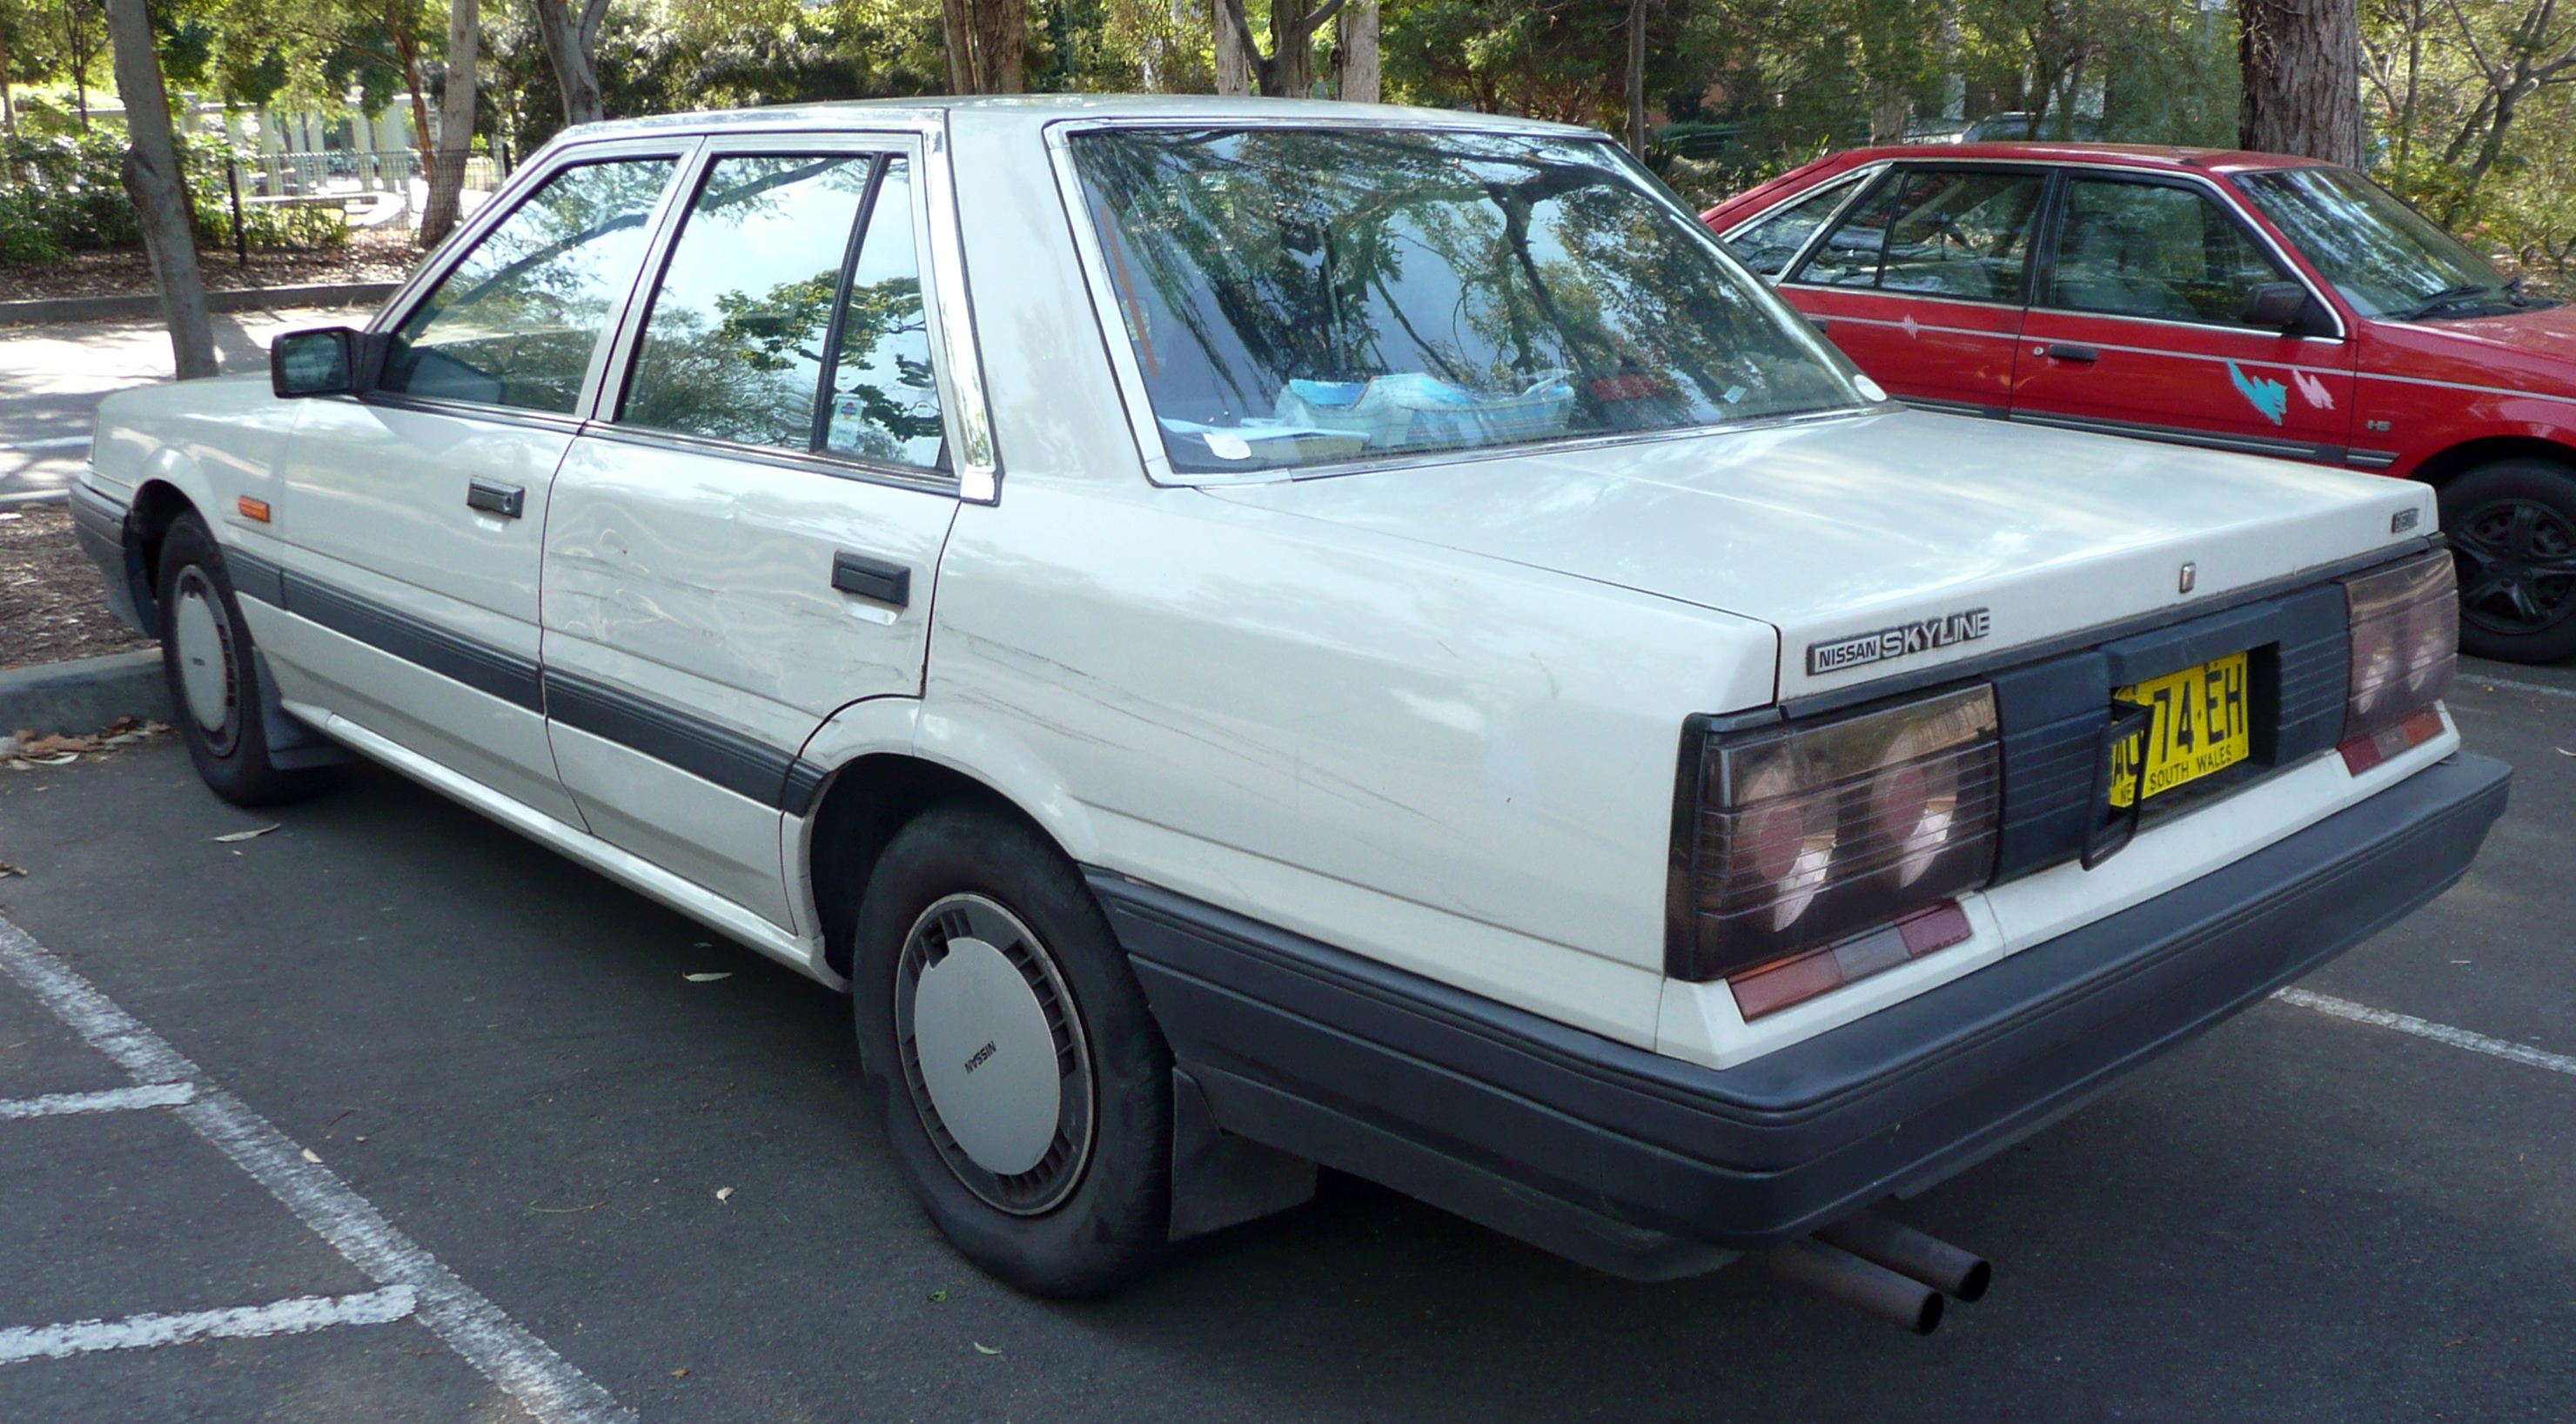 Nissan Skyline VII (R31) 1985 - 1989 Station wagon 5 door #2